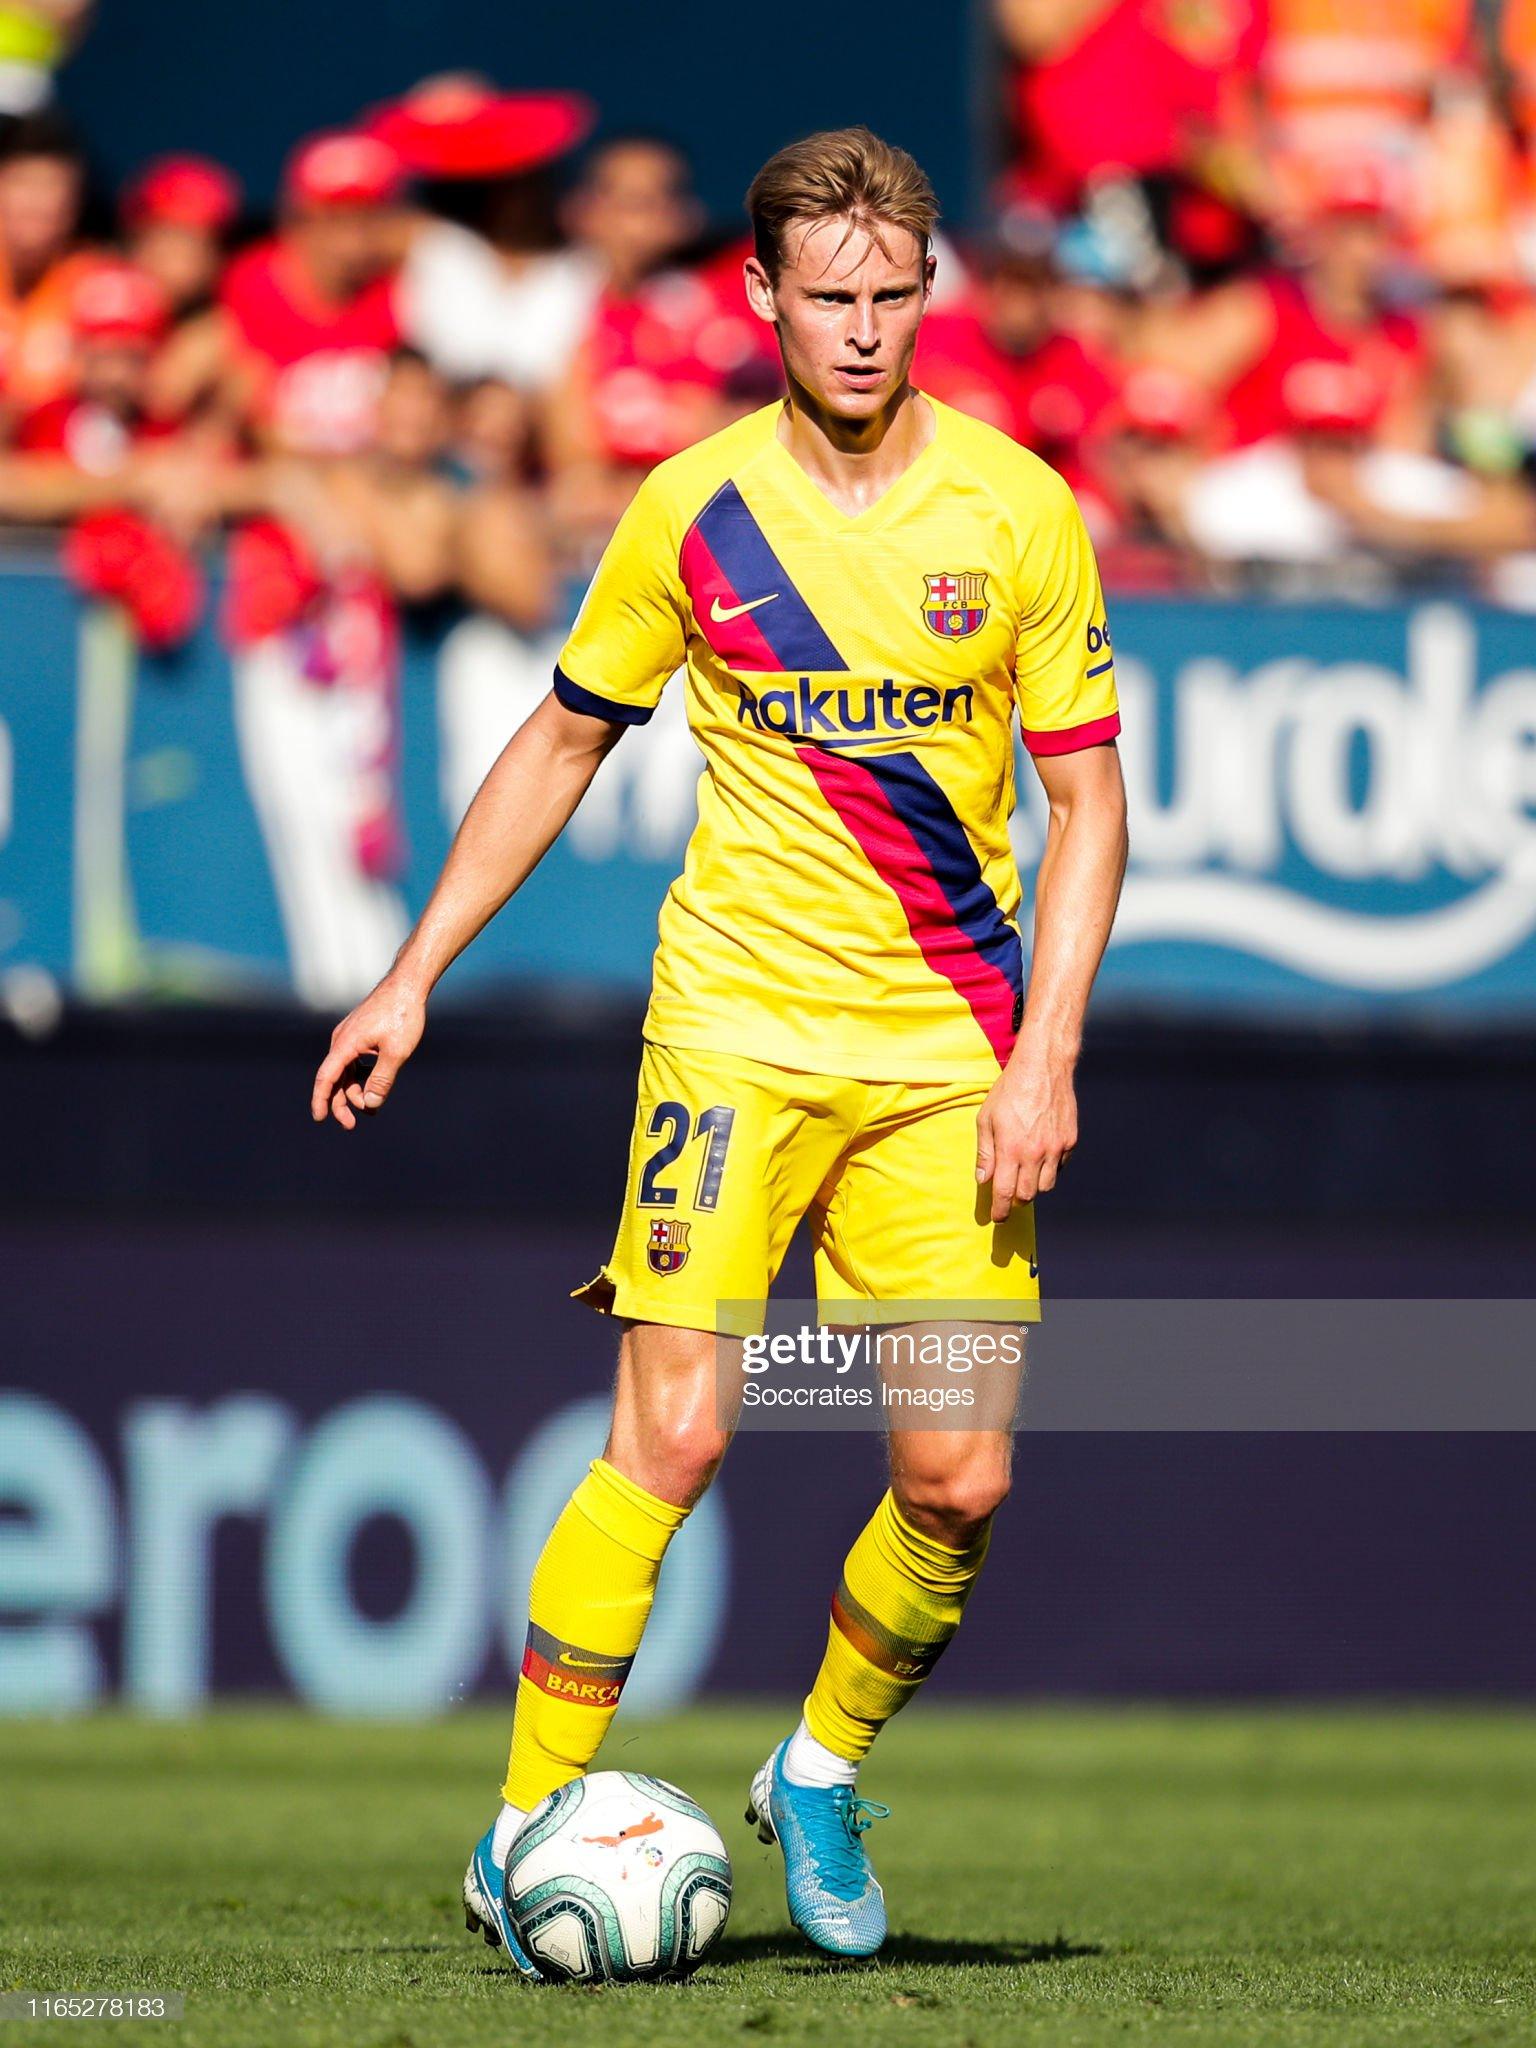 صور مباراة : أوساسونا - برشلونة 2-2 ( 31-08-2019 )  Frenkie-de-jong-of-fc-barcelona-during-the-la-liga-santander-match-picture-id1165278183?s=2048x2048